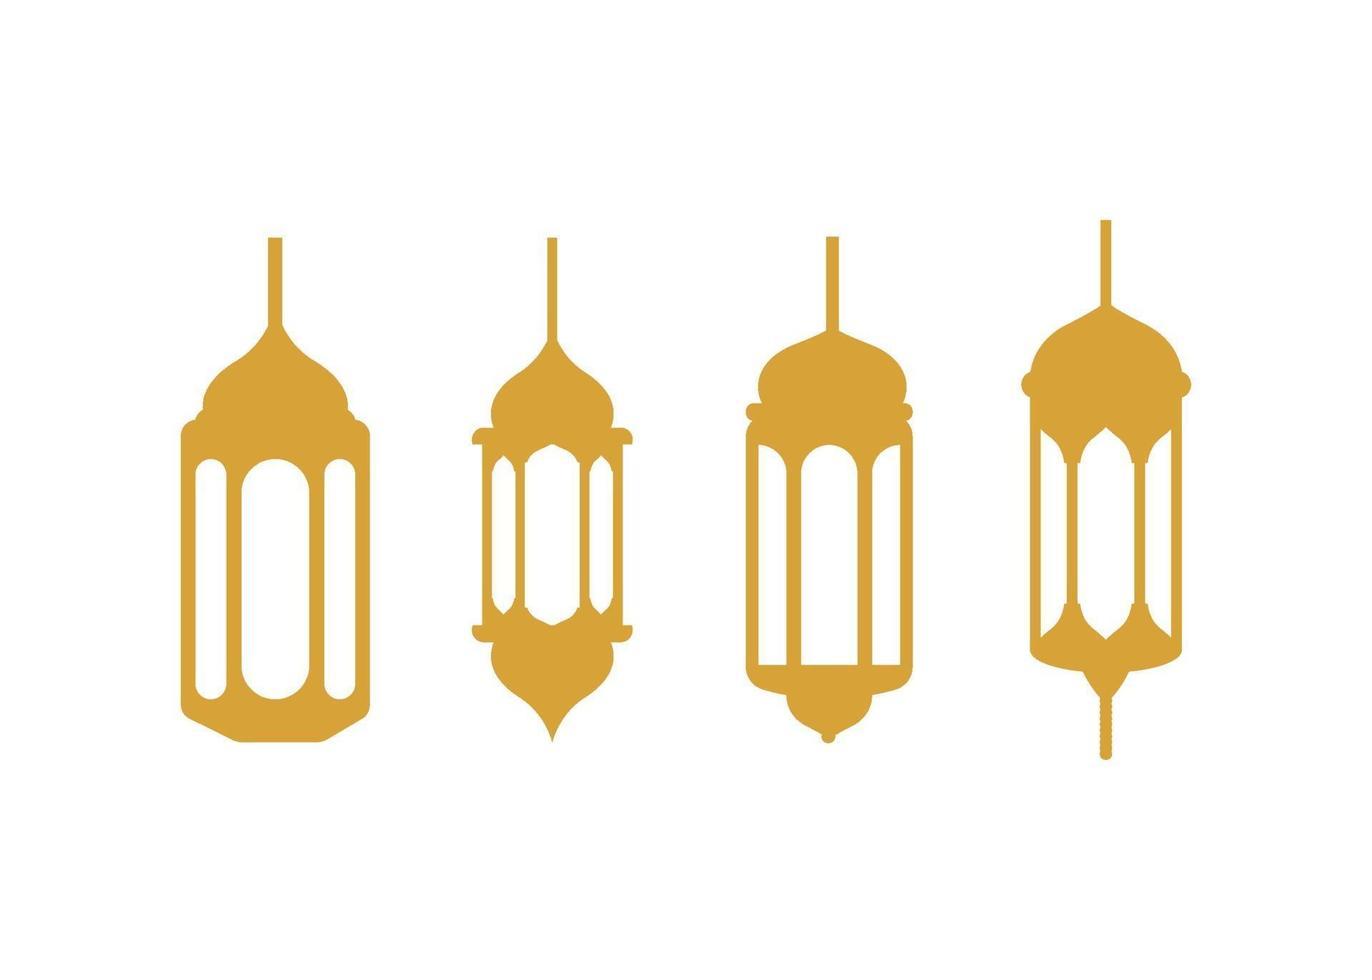 Fanoos lantaarn pictogram illustratie vector set